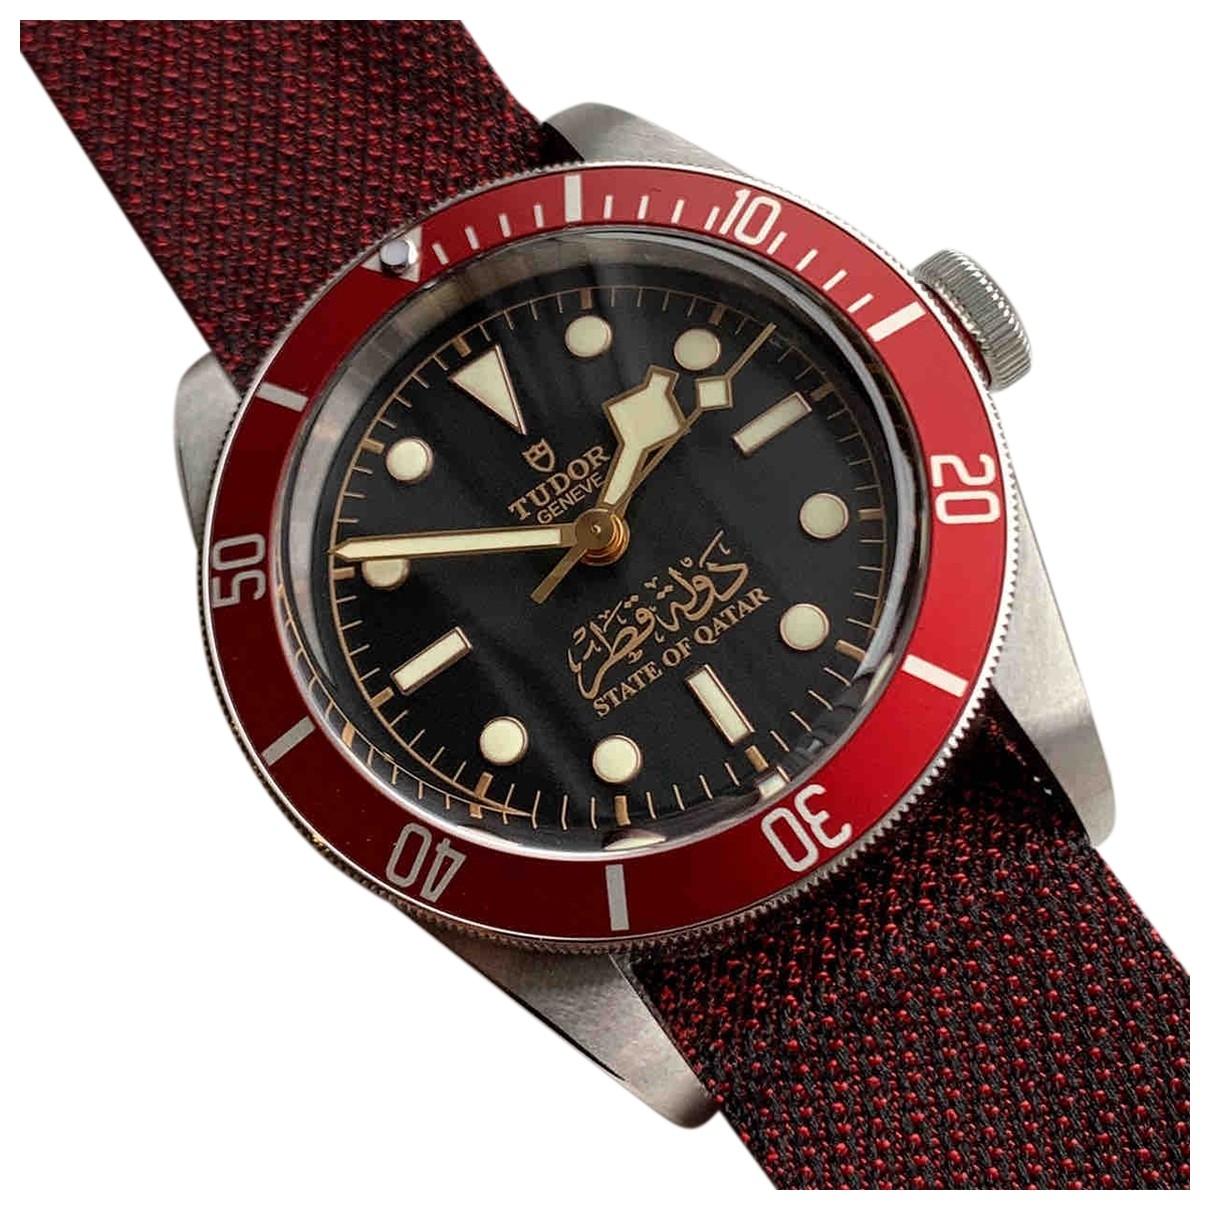 Tudor Black Bay 41mm Uhr in  Bordeauxrot Stahl